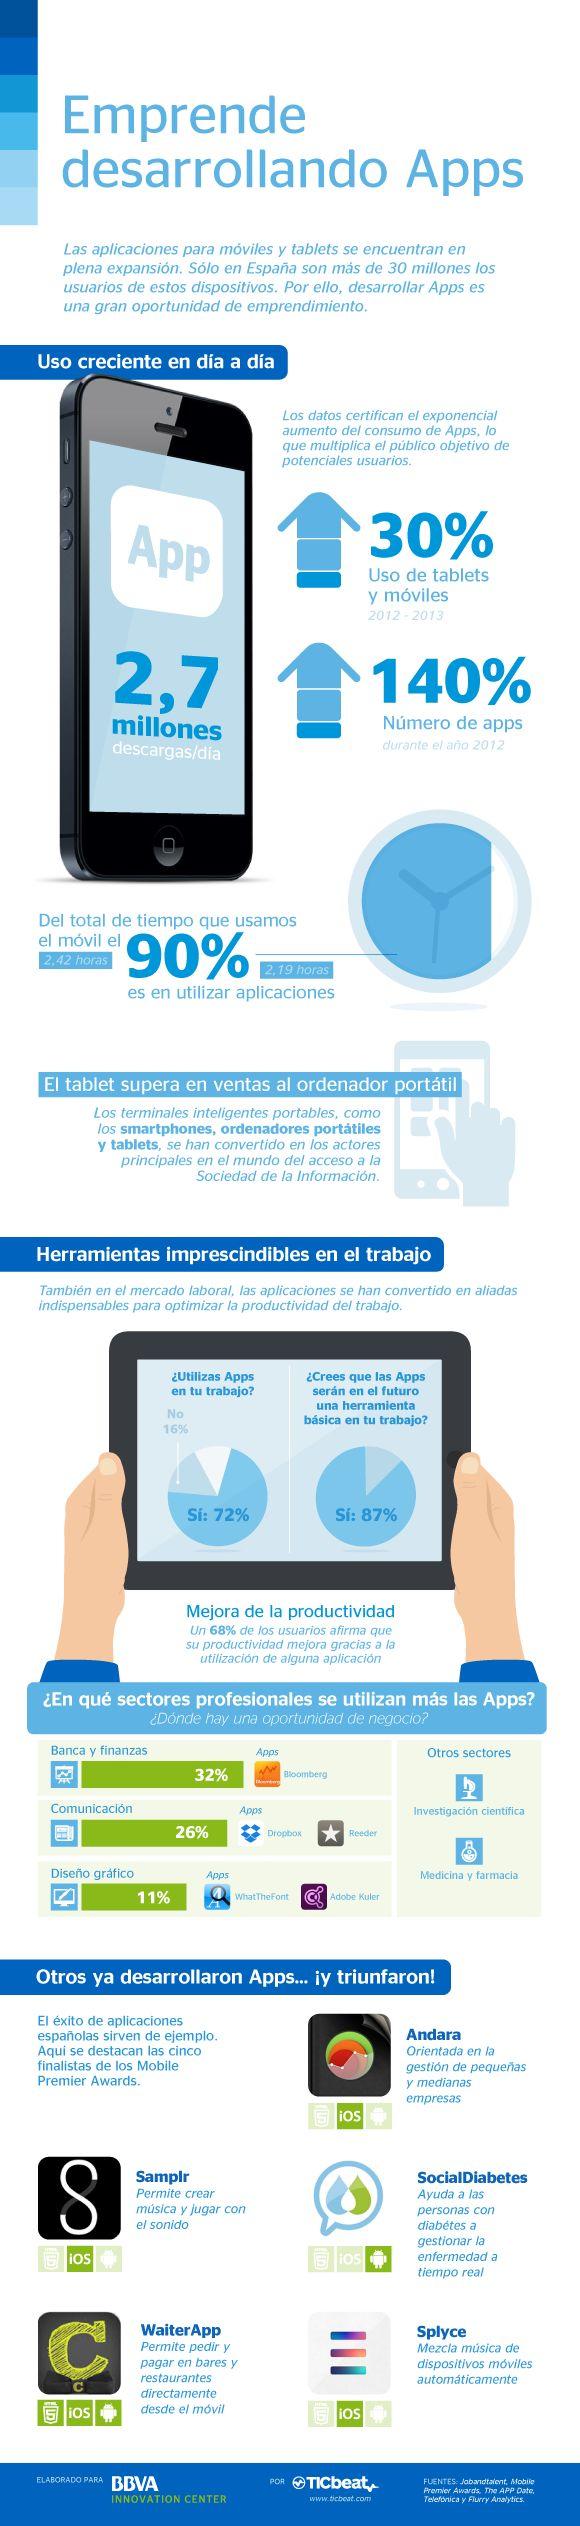 Emprende desarrollando APPs #infografia